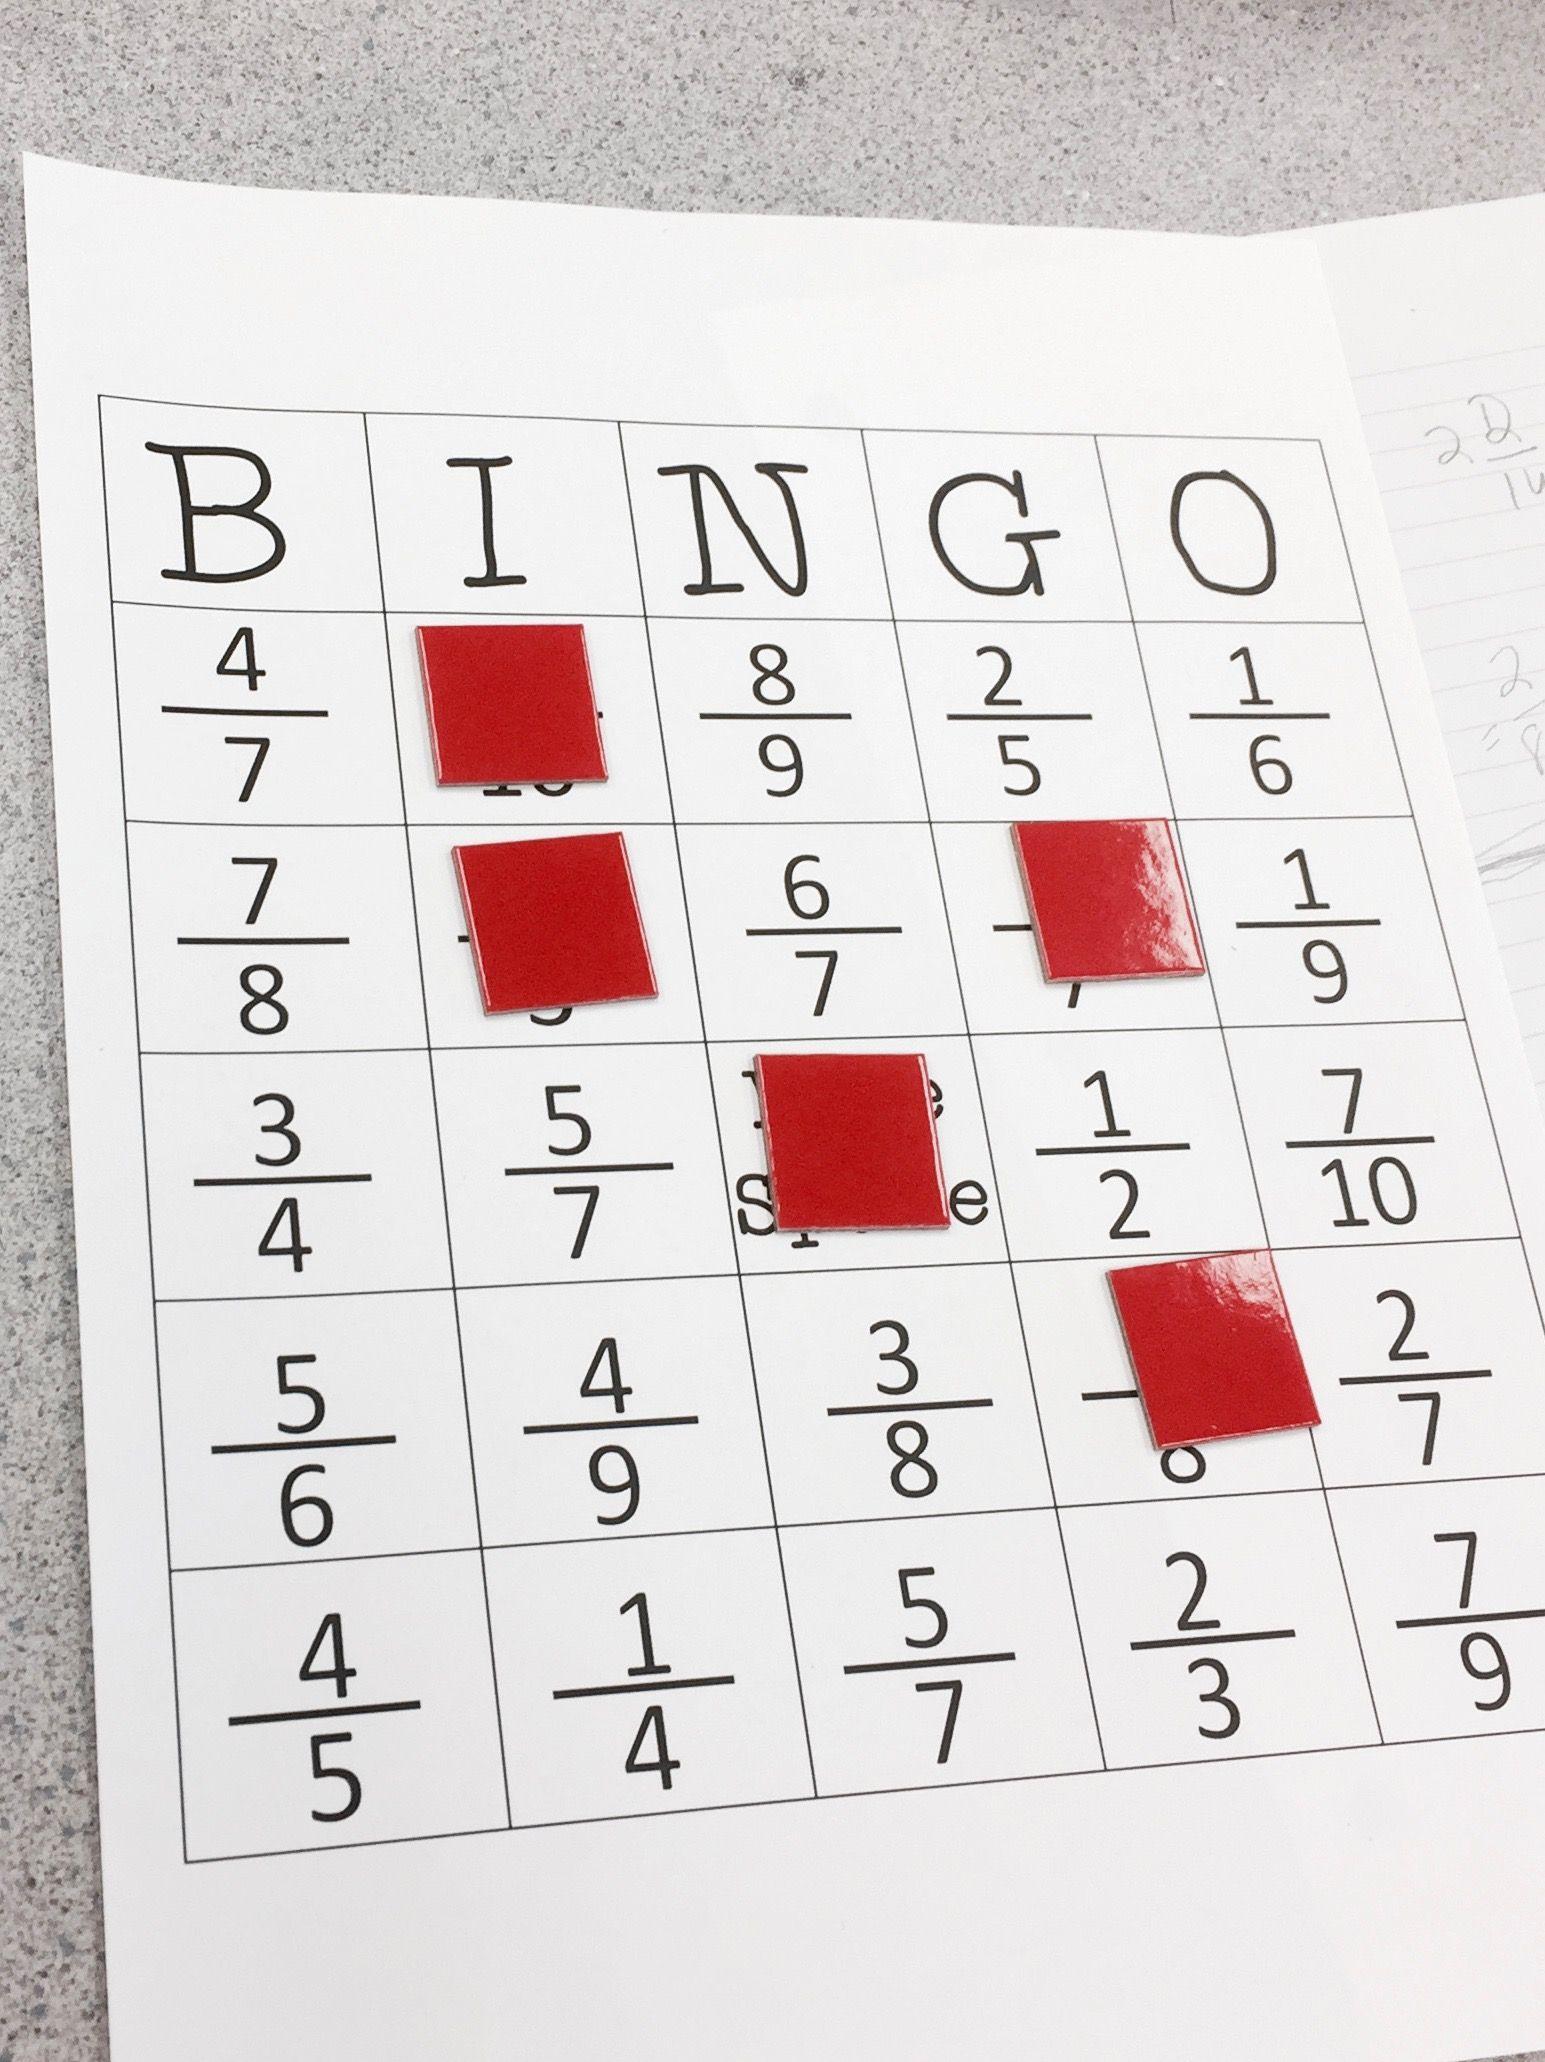 Equivalent Fraction Bingo   Elementary Education Collaborative Board - Fraction Bingo Cards Printable Free